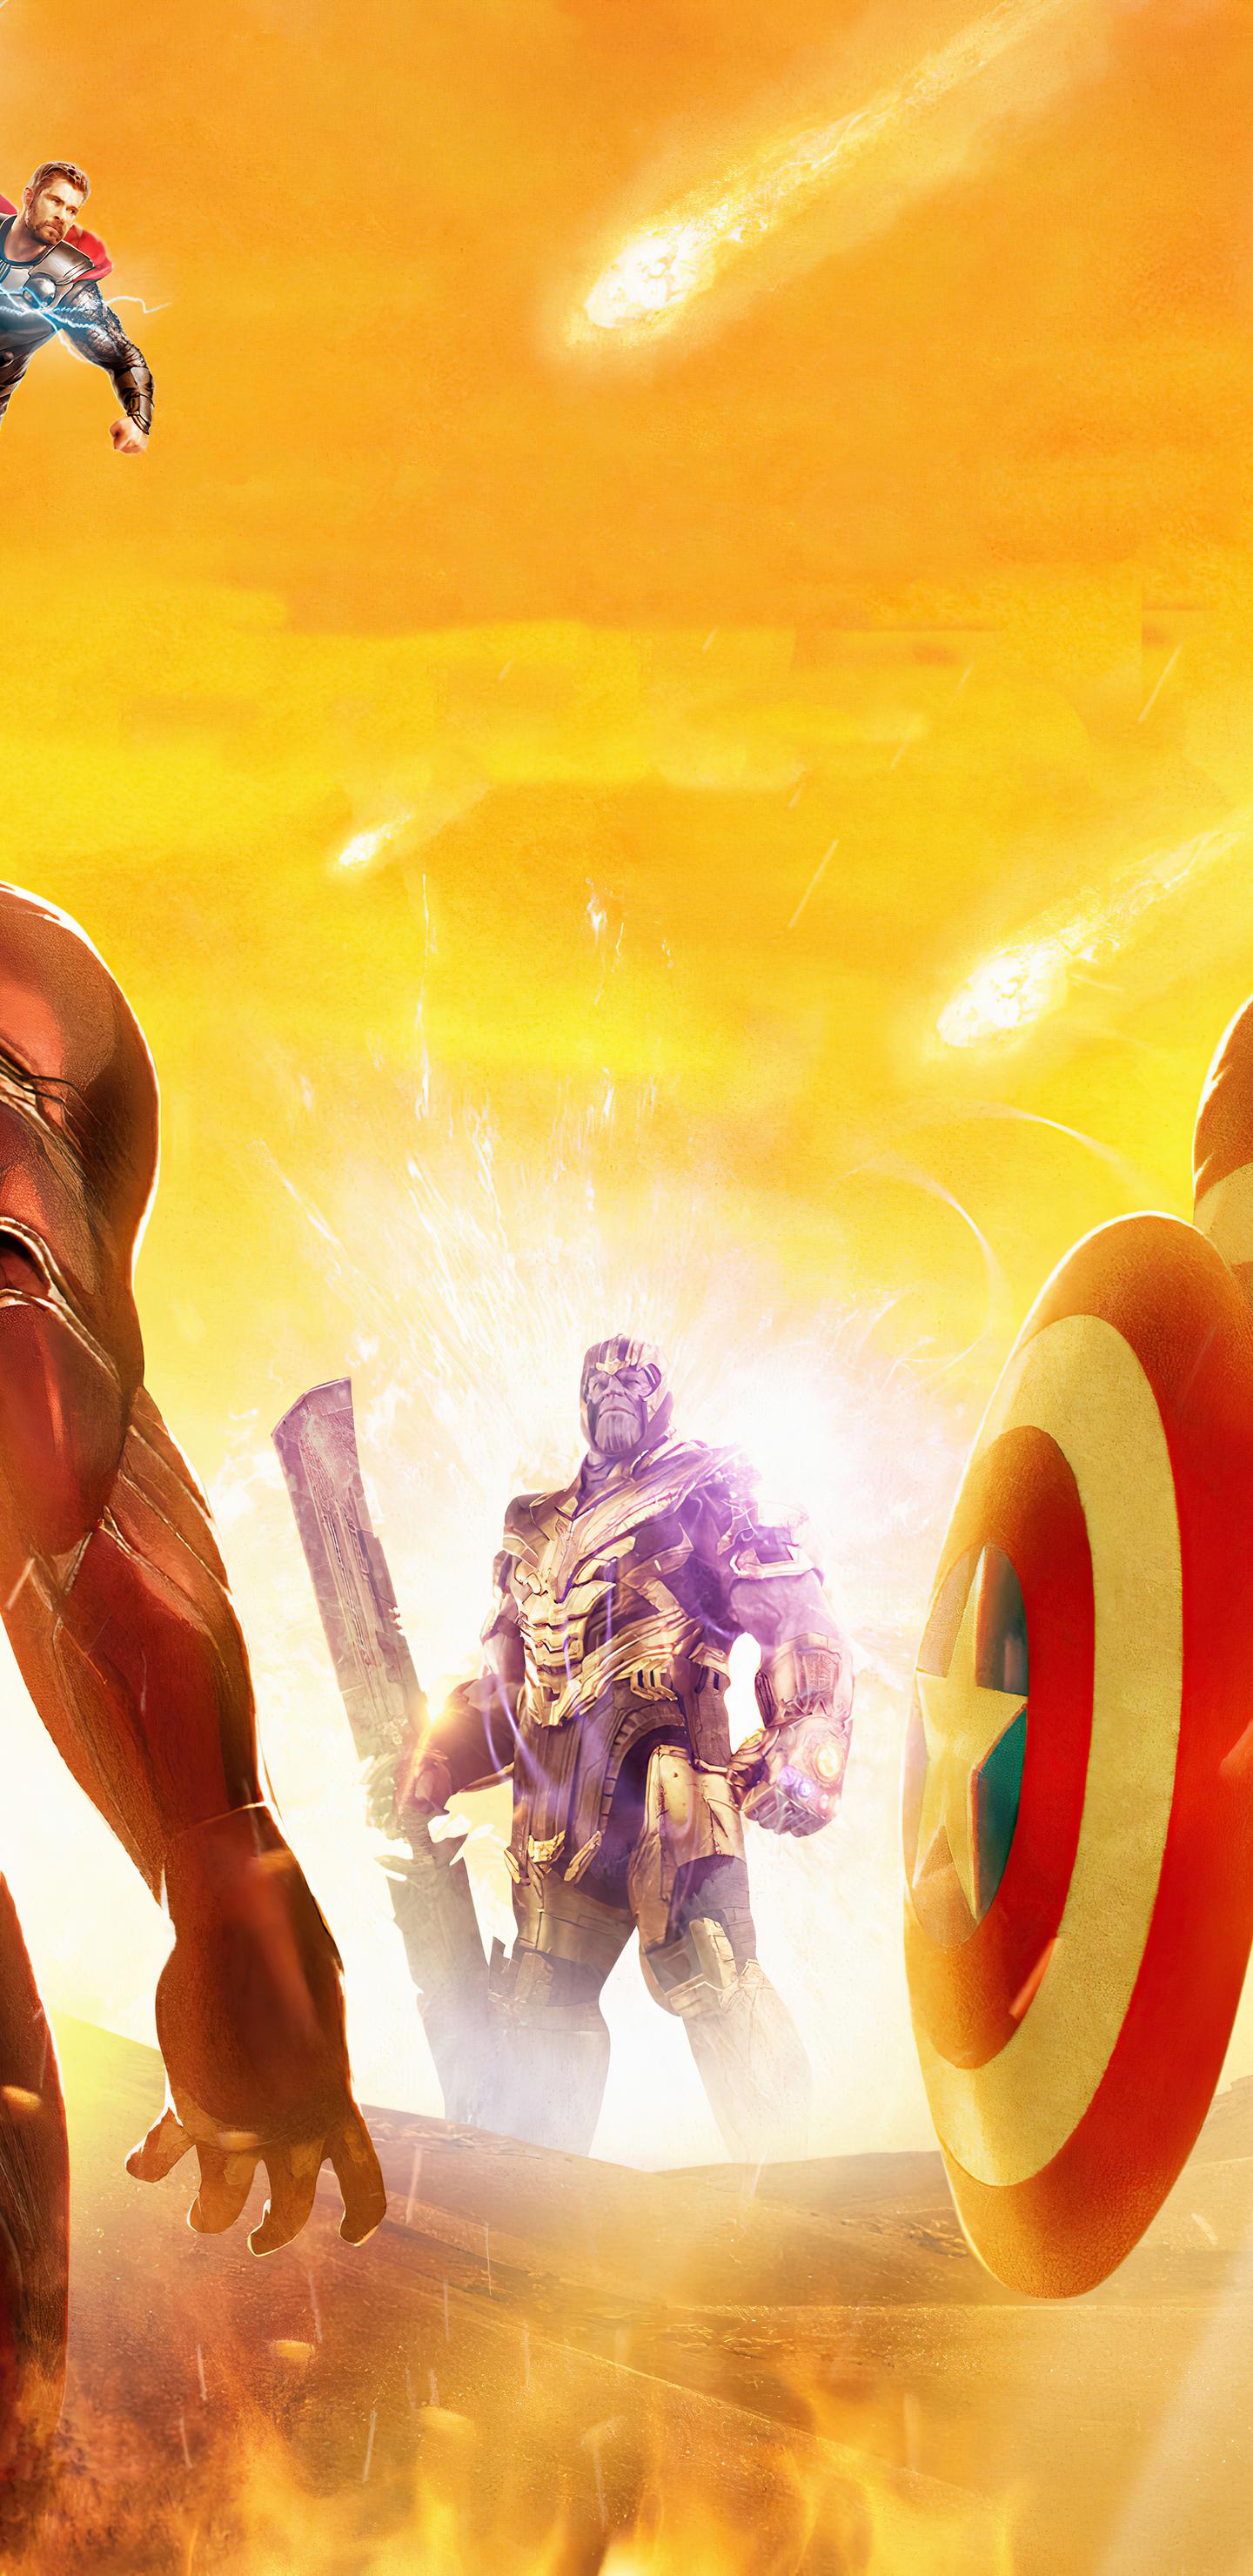 thanos-avengers-end-game-4k-m1.jpg